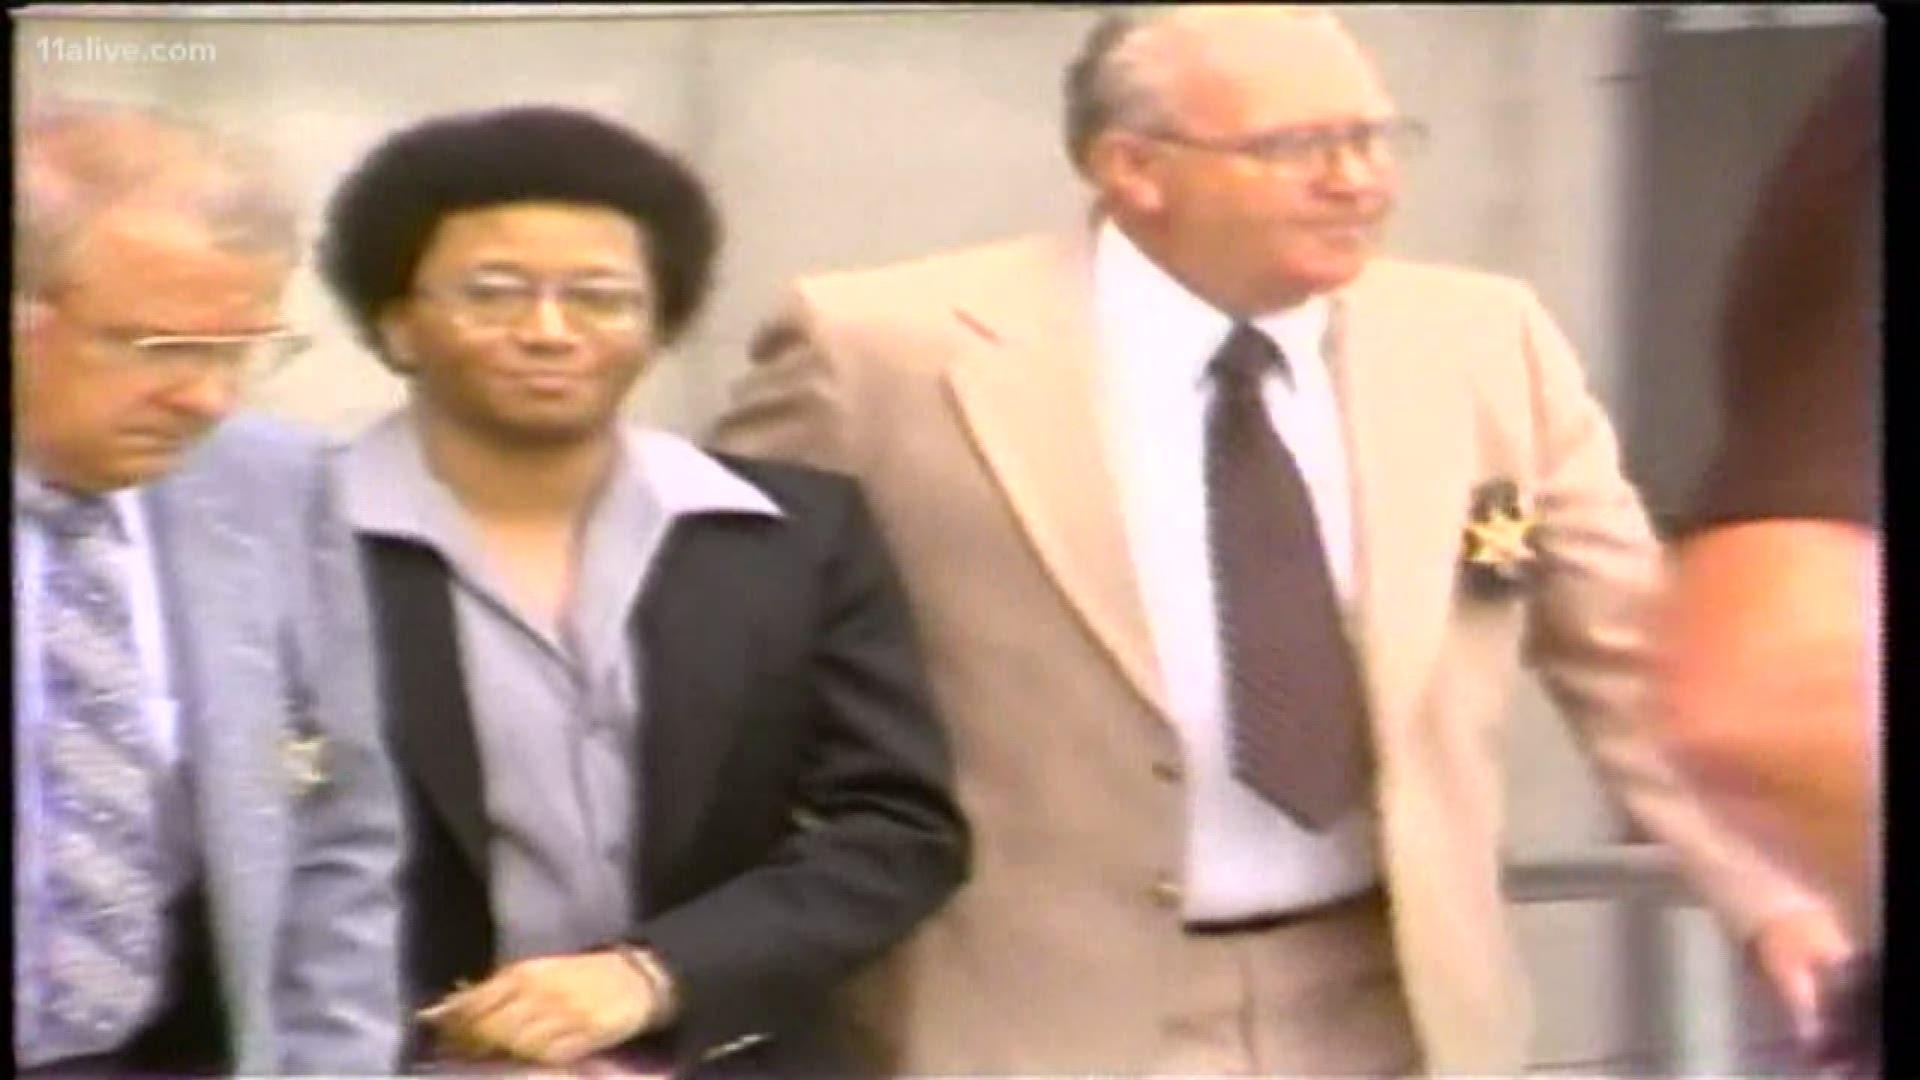 Wayne Williams Atlanta Child Murders Suspect Denied Parole 11alive Com